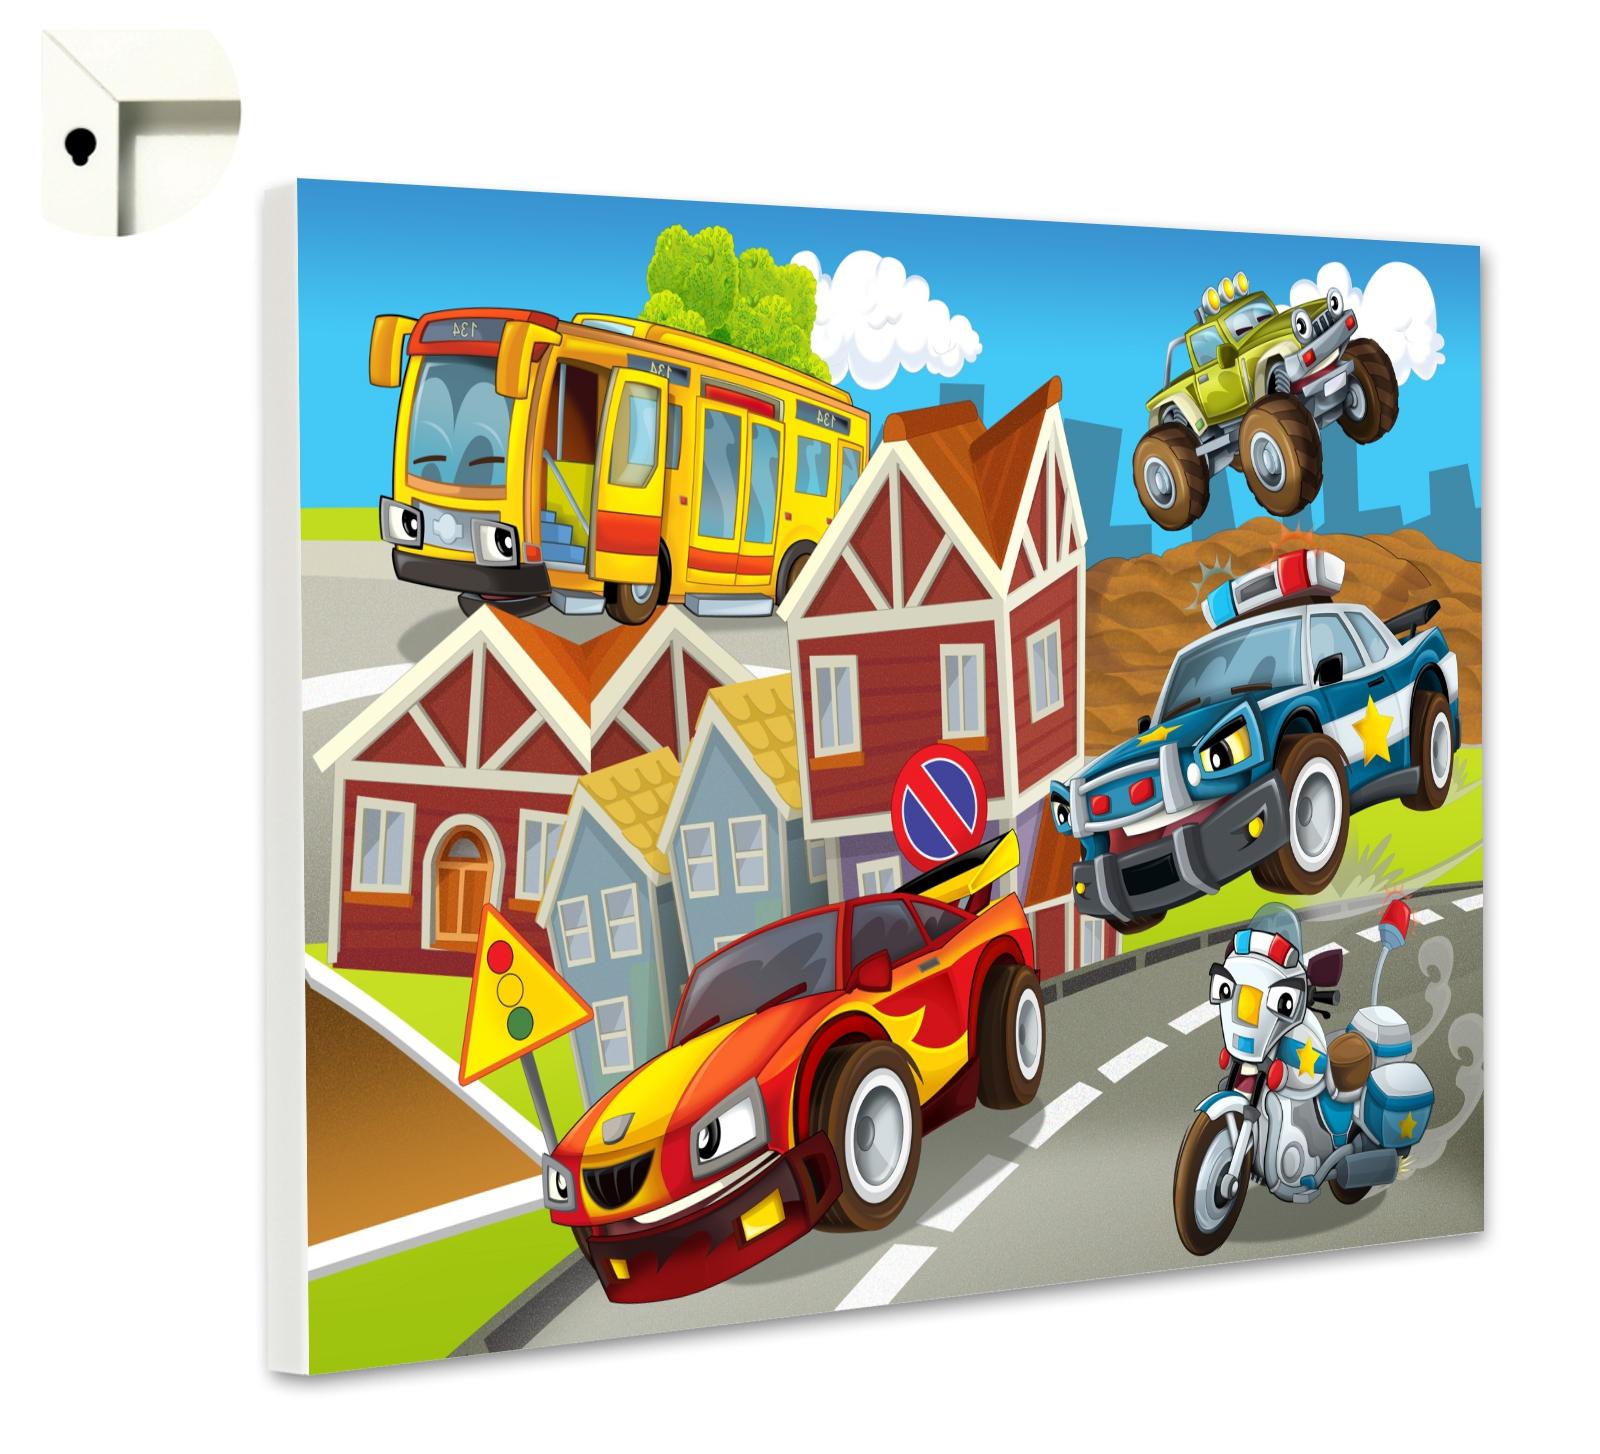 magnettafel motiv kinder rennwagen, polizei & motorrad | kinder